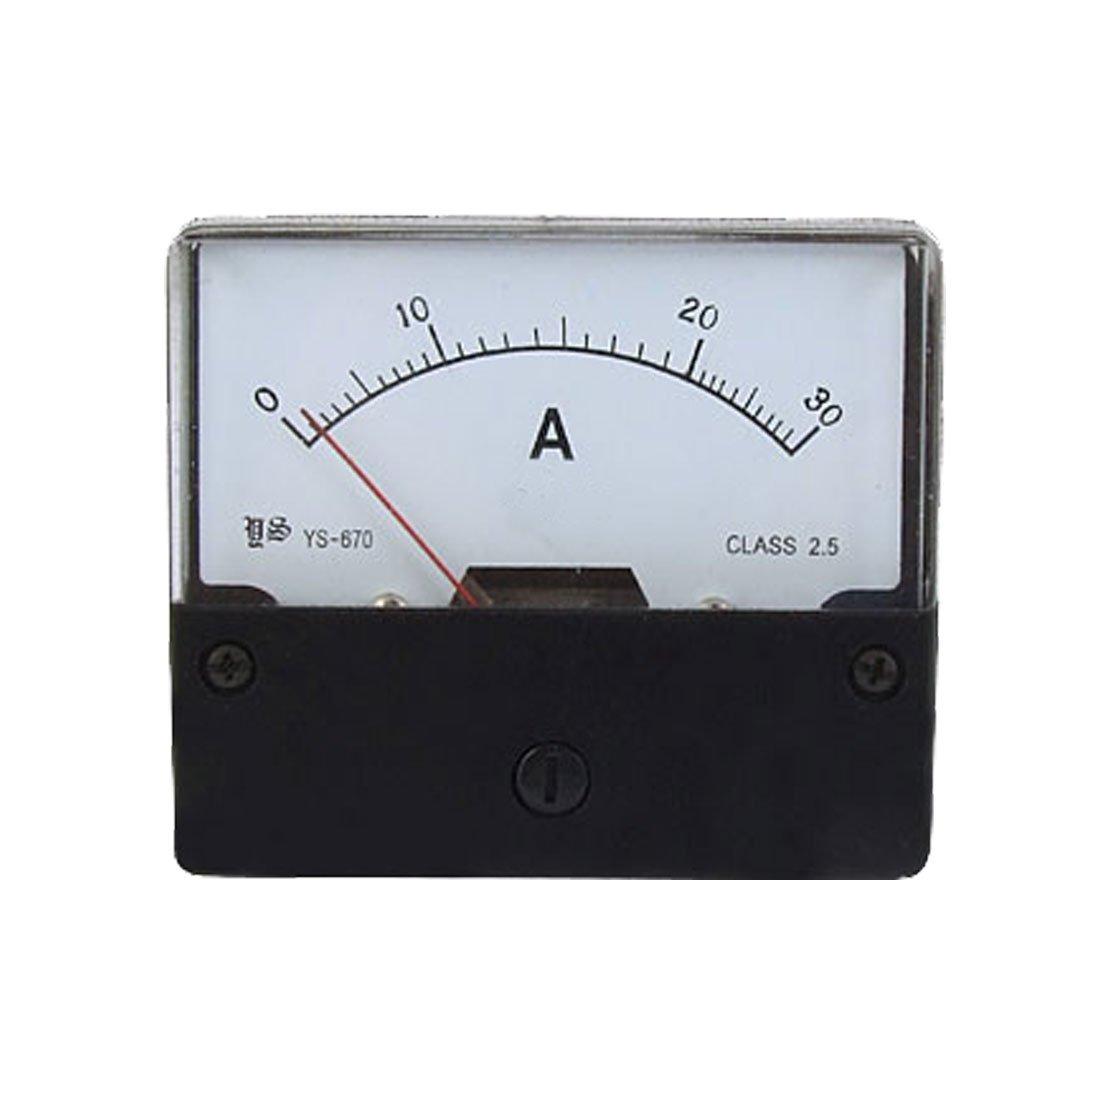 AC 30A Rectangular Panel Analog Meter Ammeter YS-670: Amazon.co.uk: DIY &  Tools